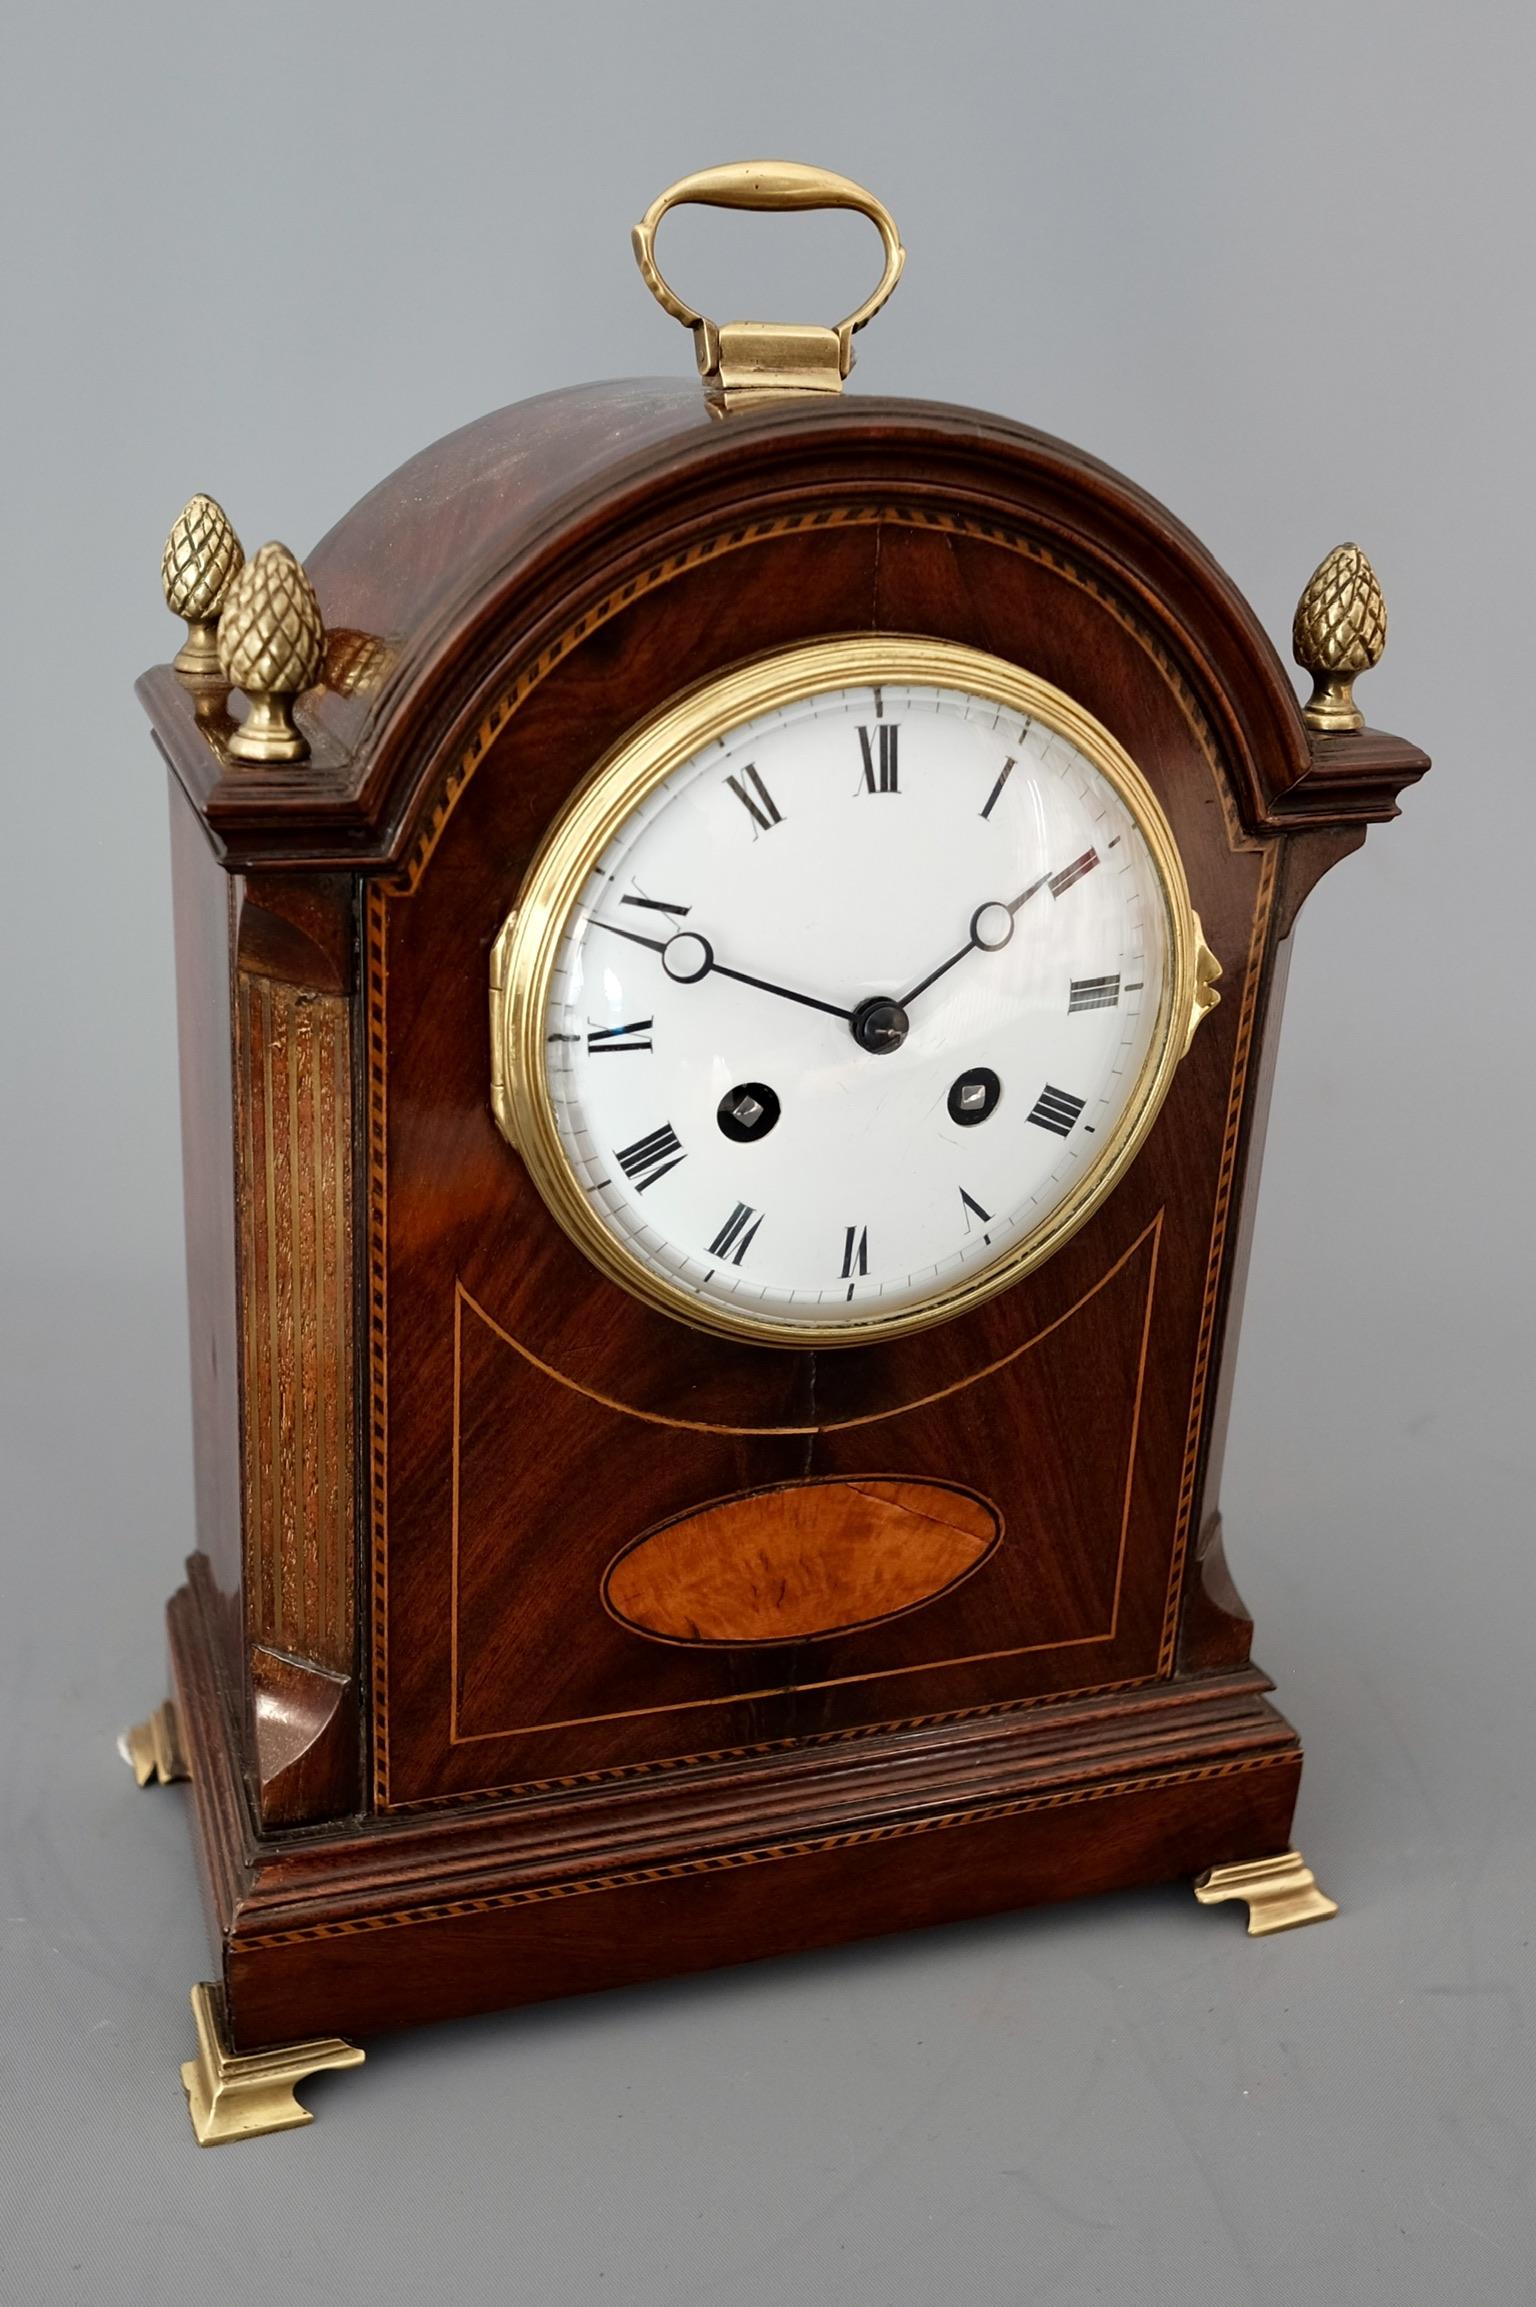 French mahogany and boxwood inlaid striking mantel clock